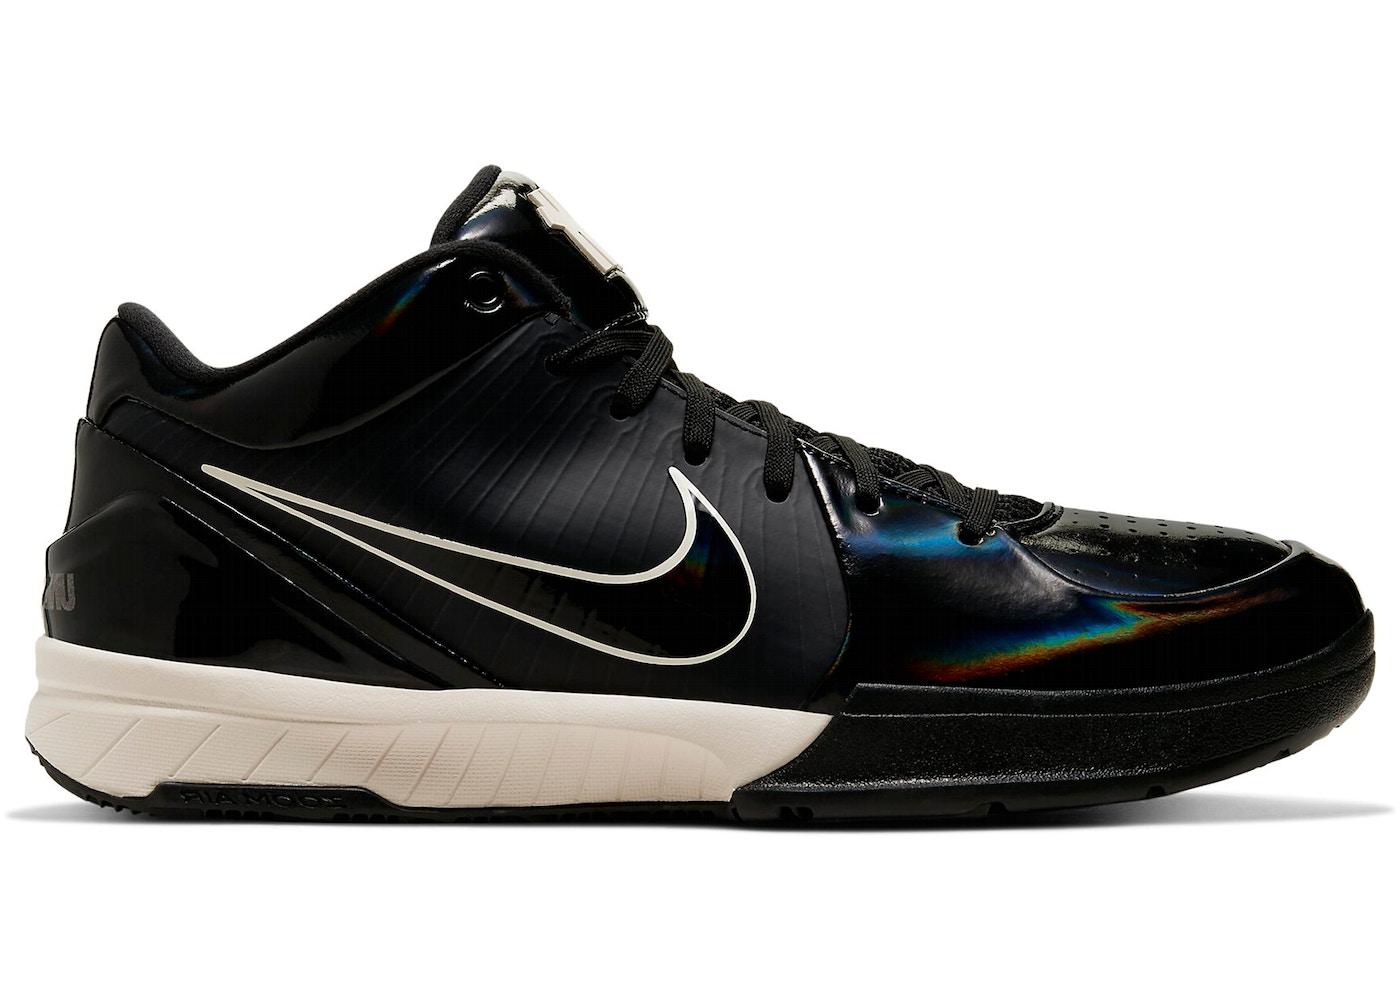 Nike Kobe 4 Protro Undefeated Black Mamba - CQ3869-001